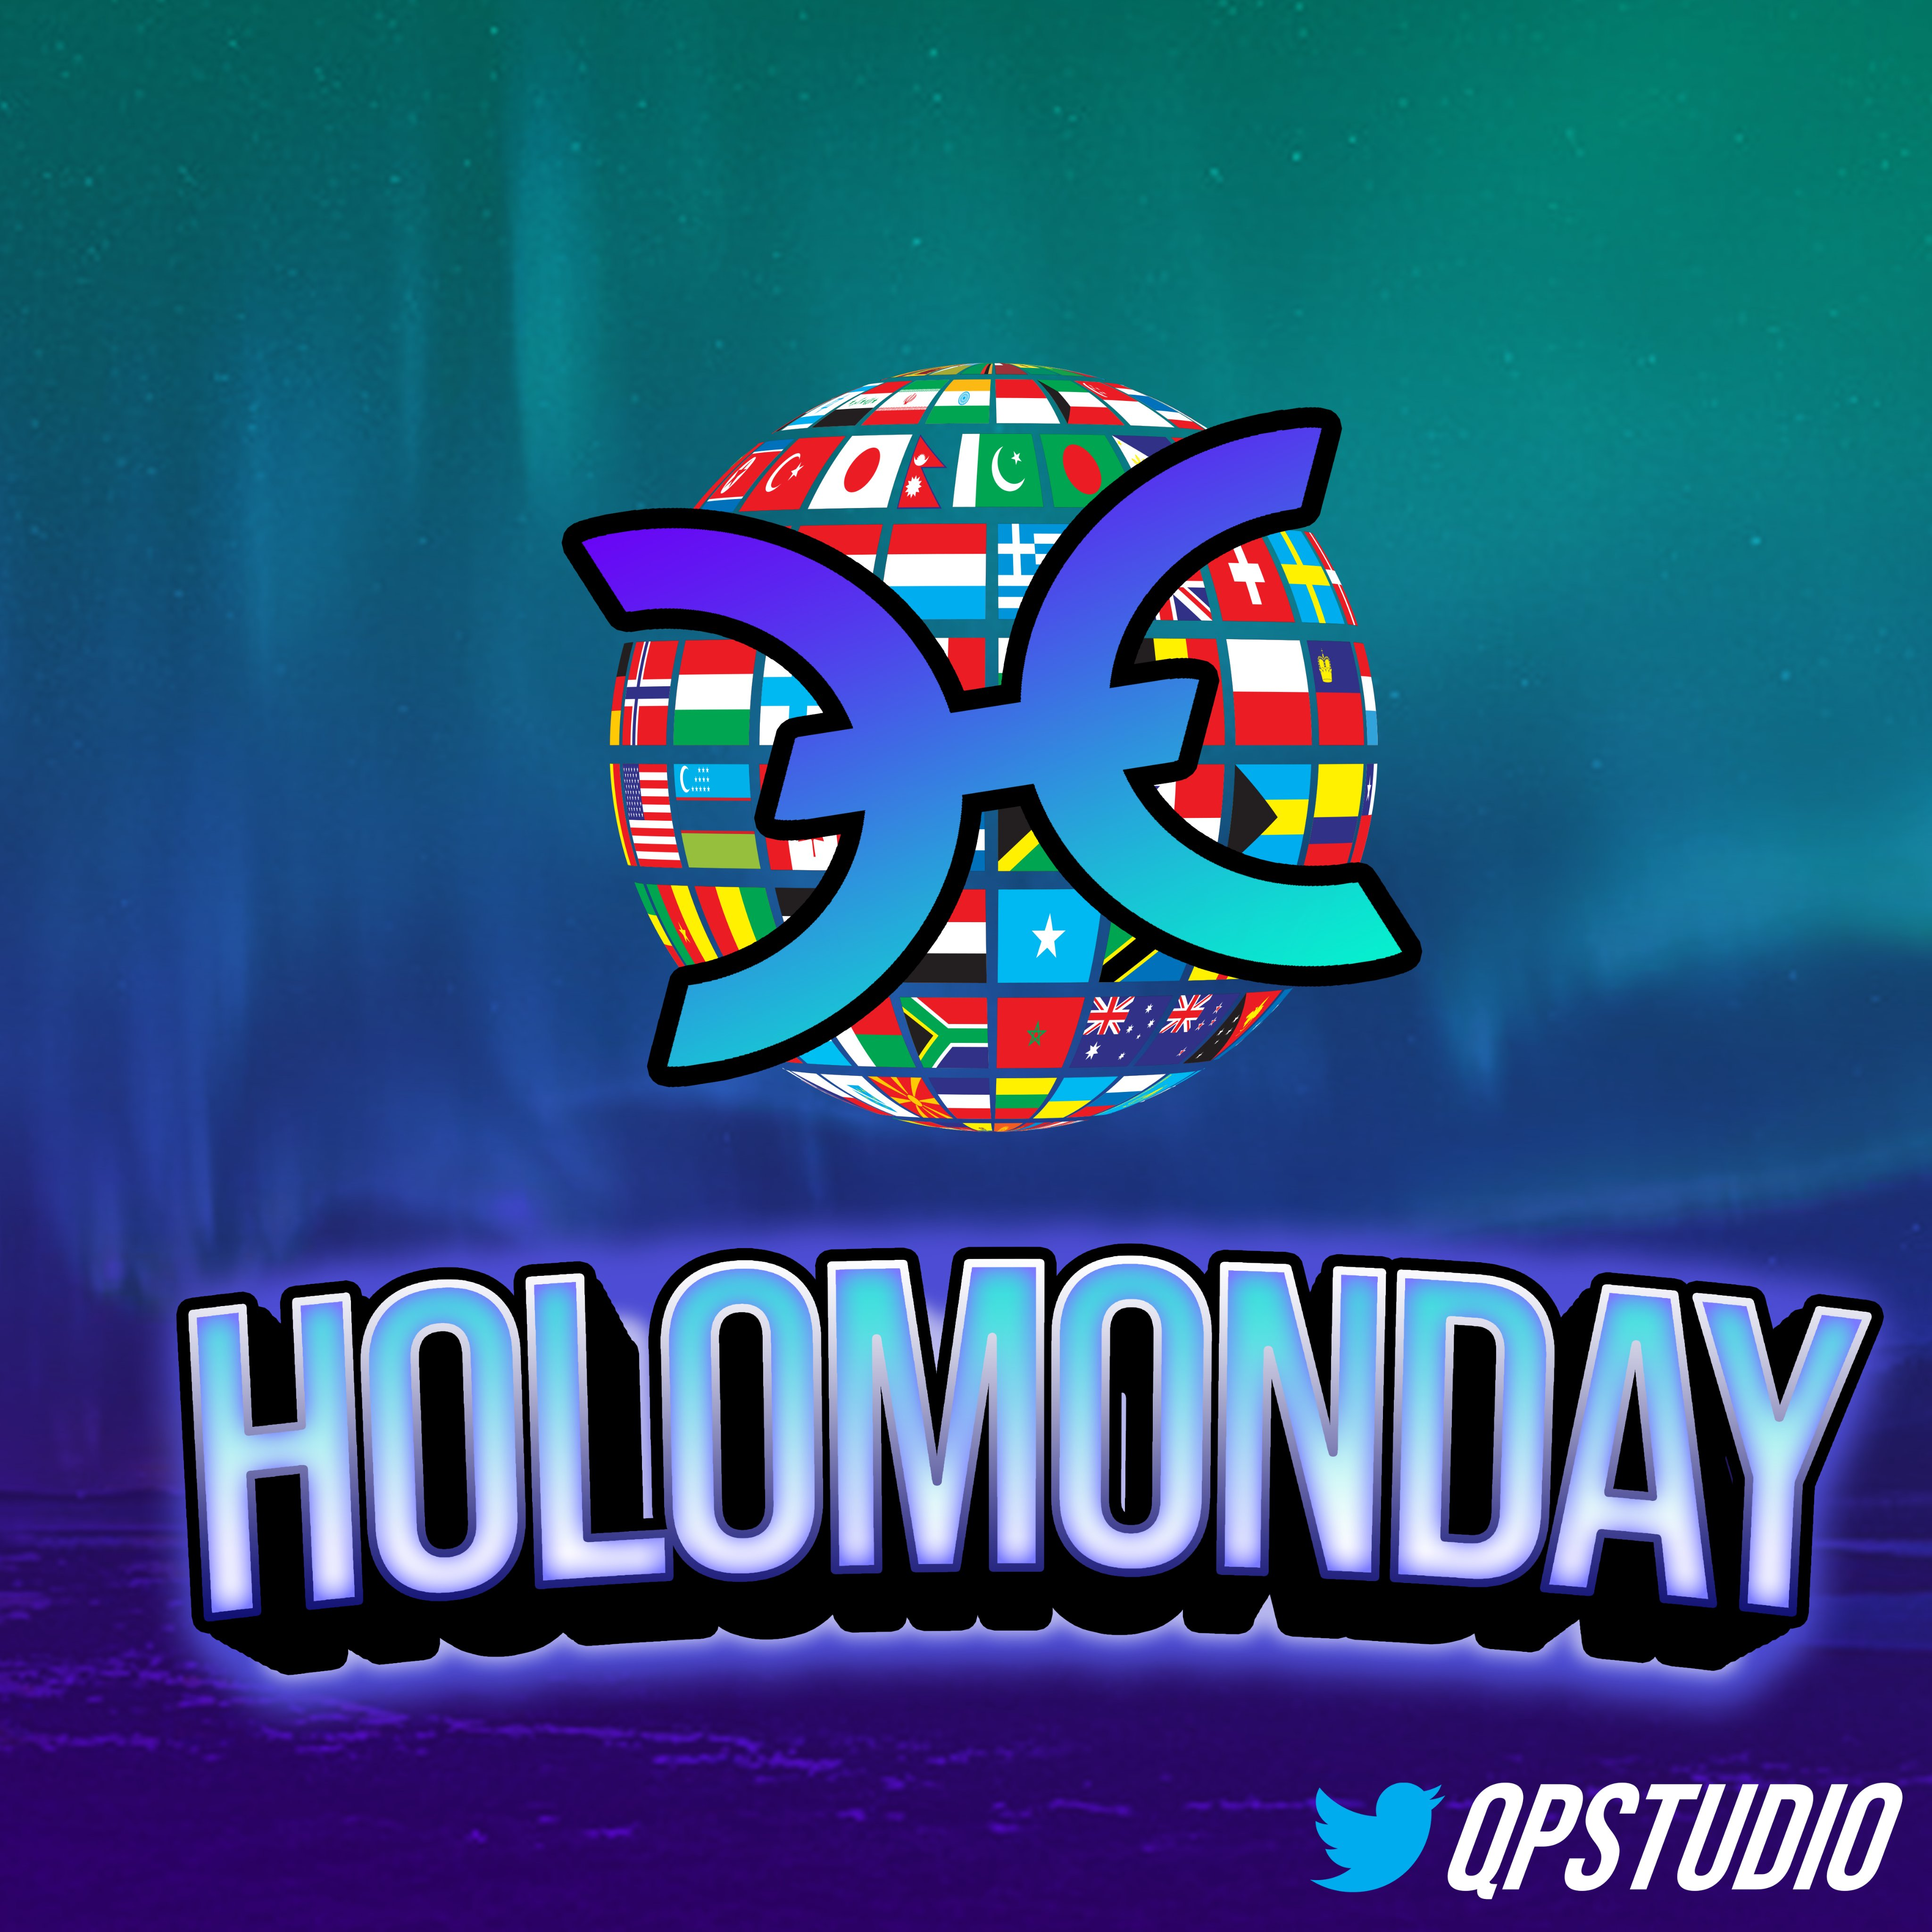 HoloMonday Flag meme